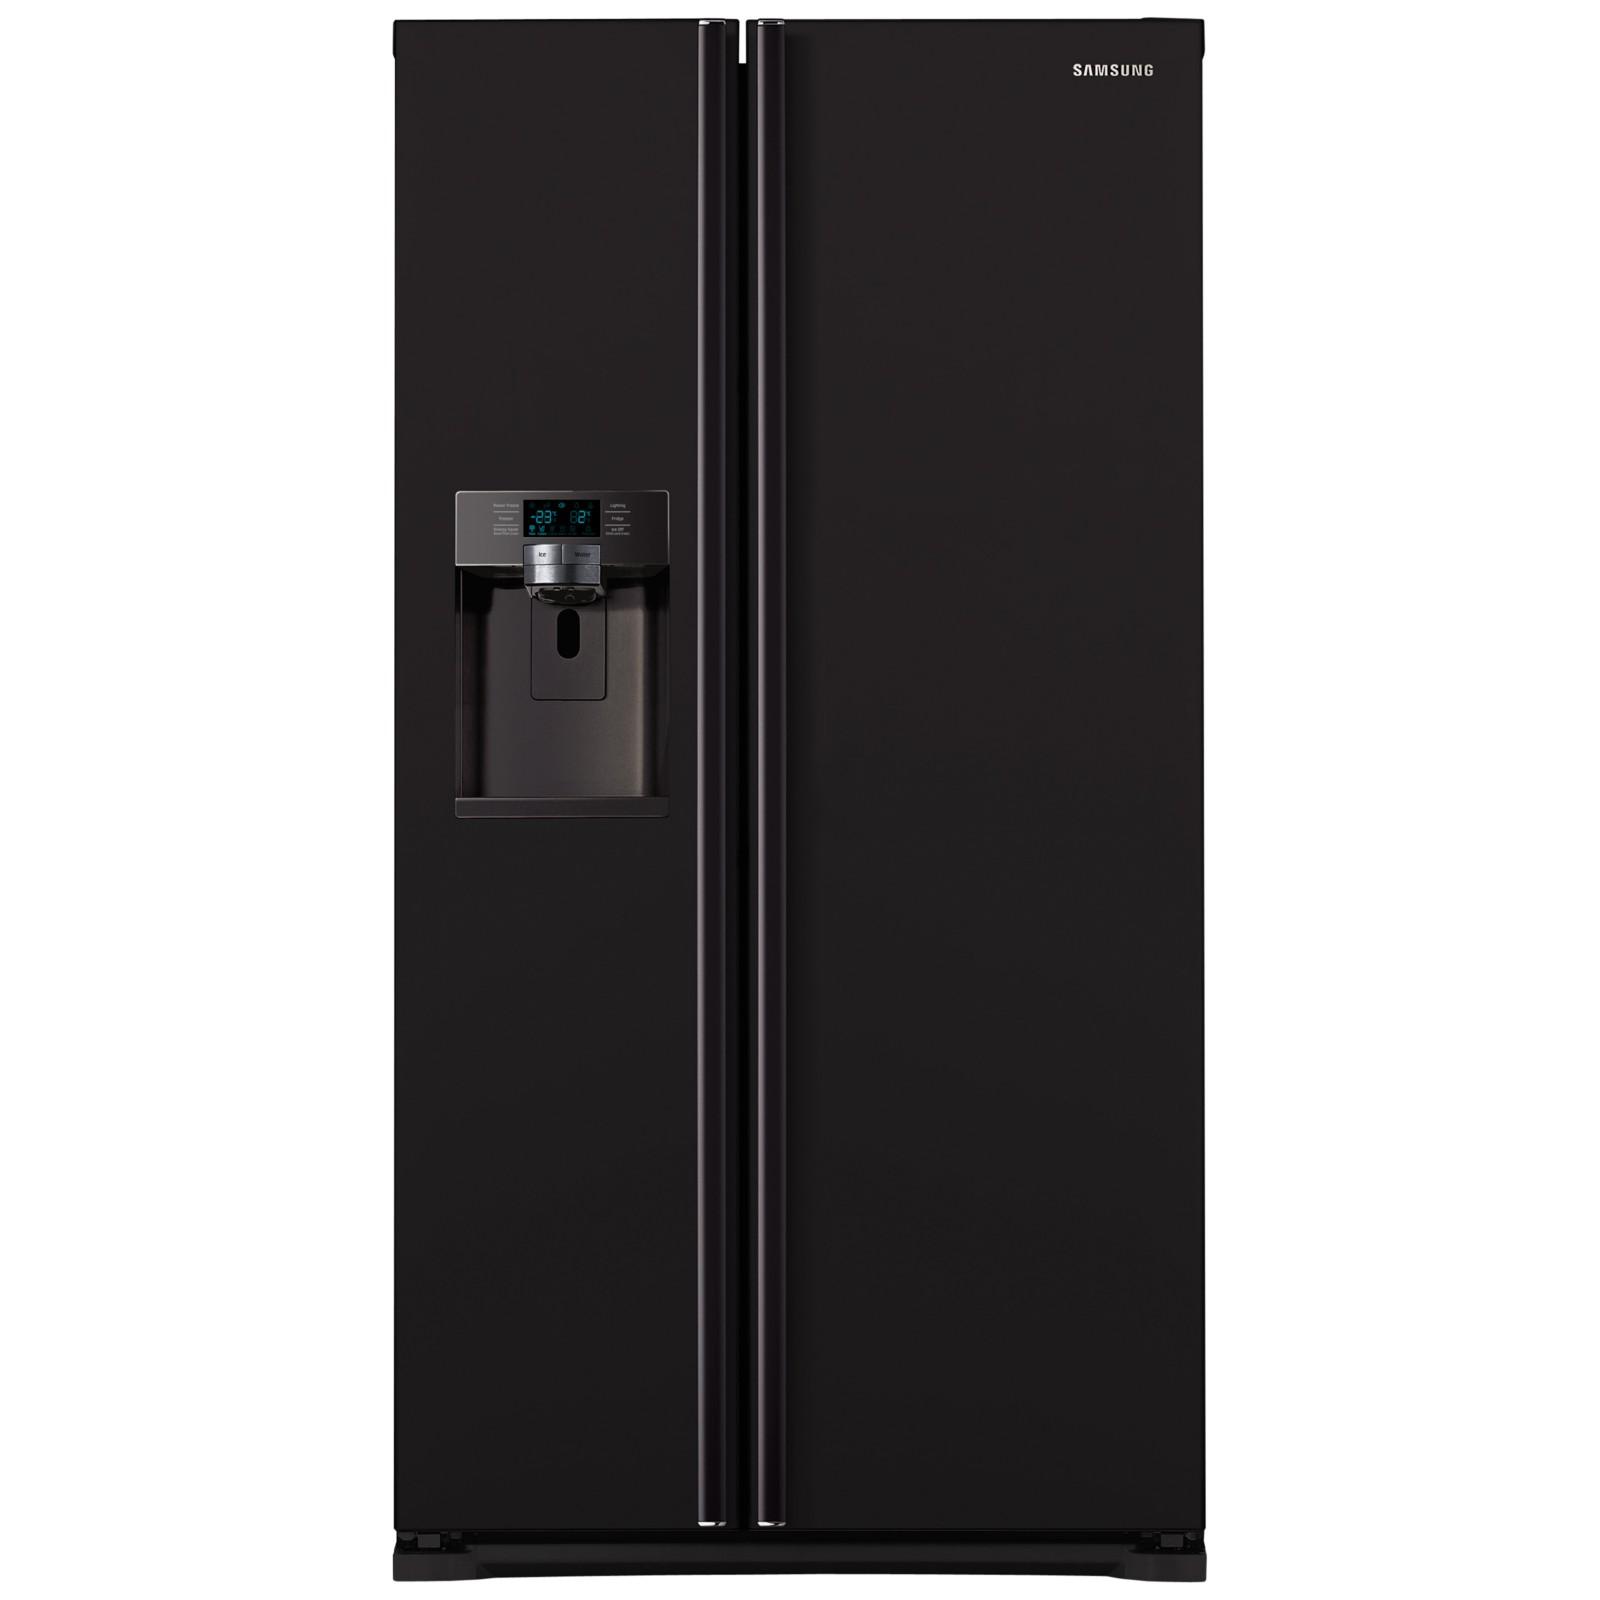 Samsung RSG5MUBP1/XEU American Style Fridge Freezer